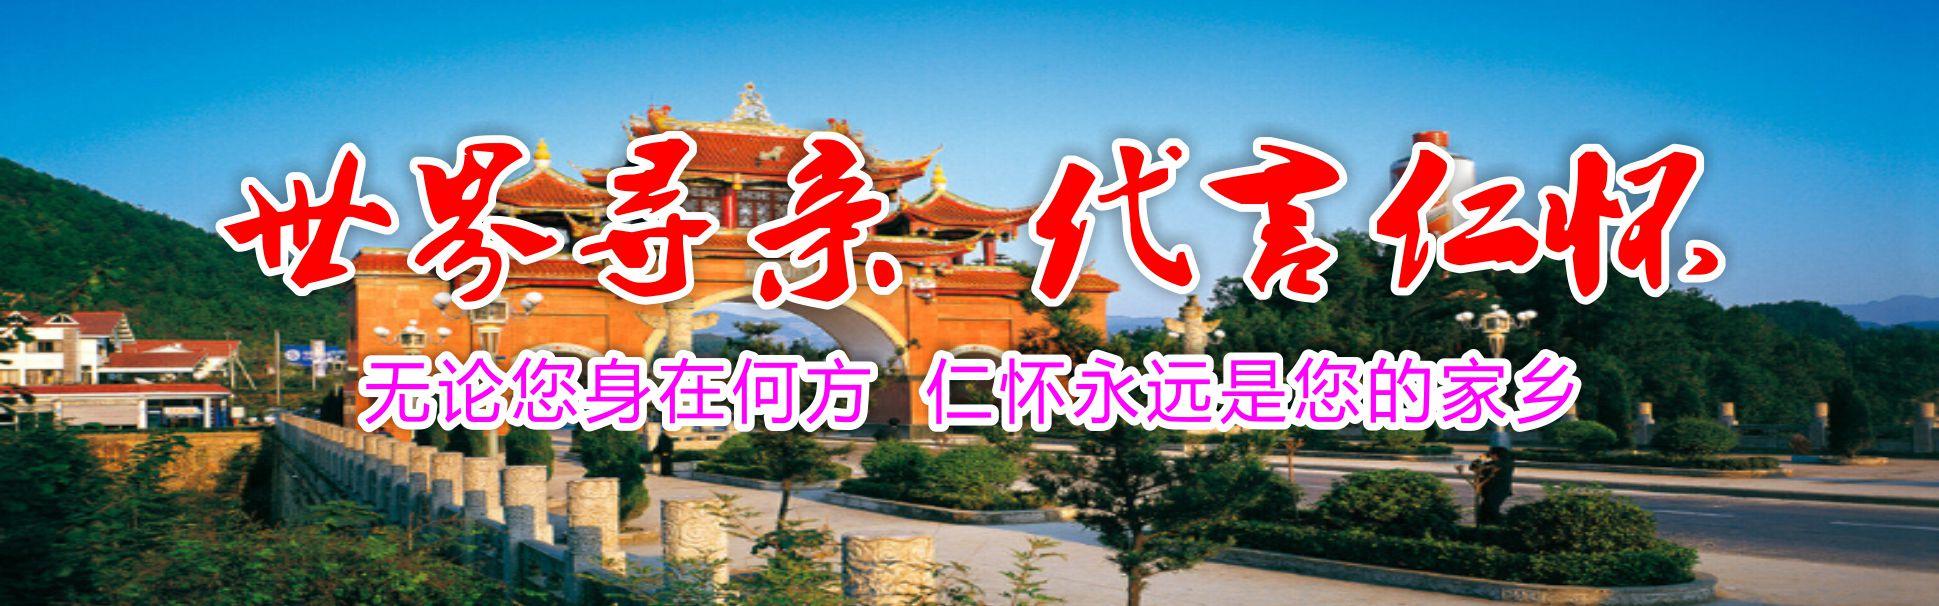 http://p3.pccoo.cn/vote/20151217/2015121723234713398752.jpg